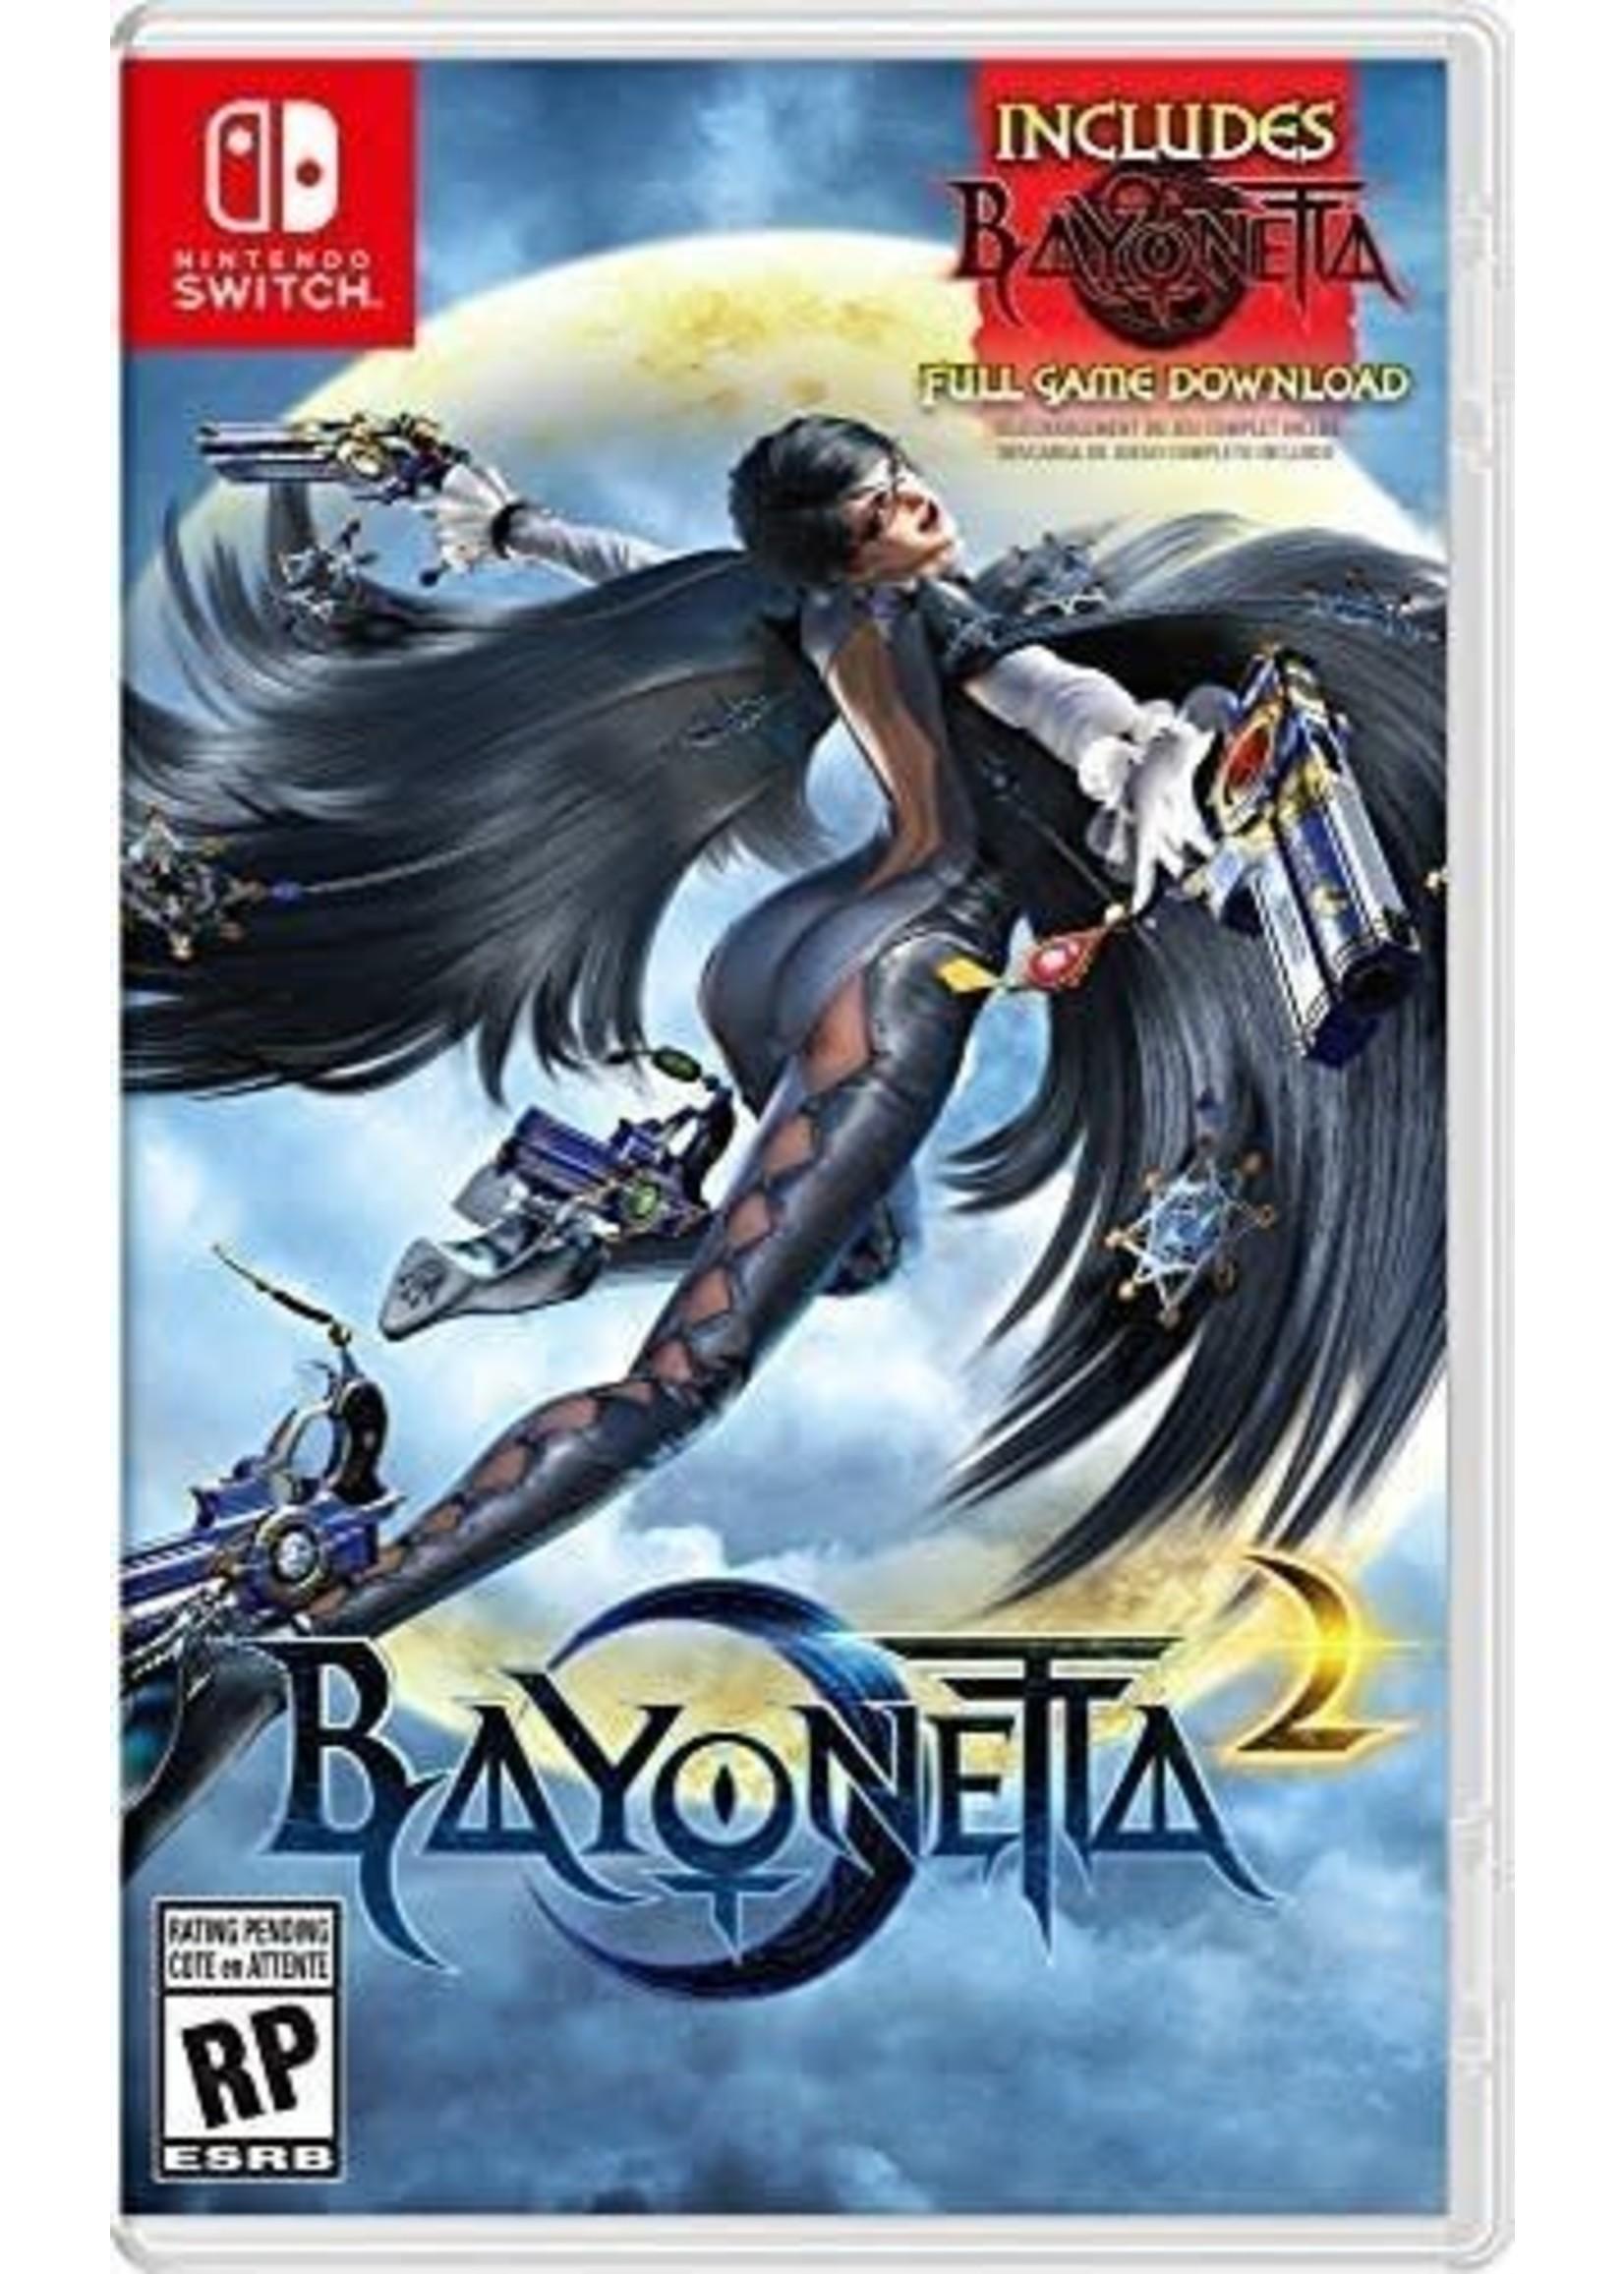 Bayonetta 2 with Bayonetta - SWITCH NEW